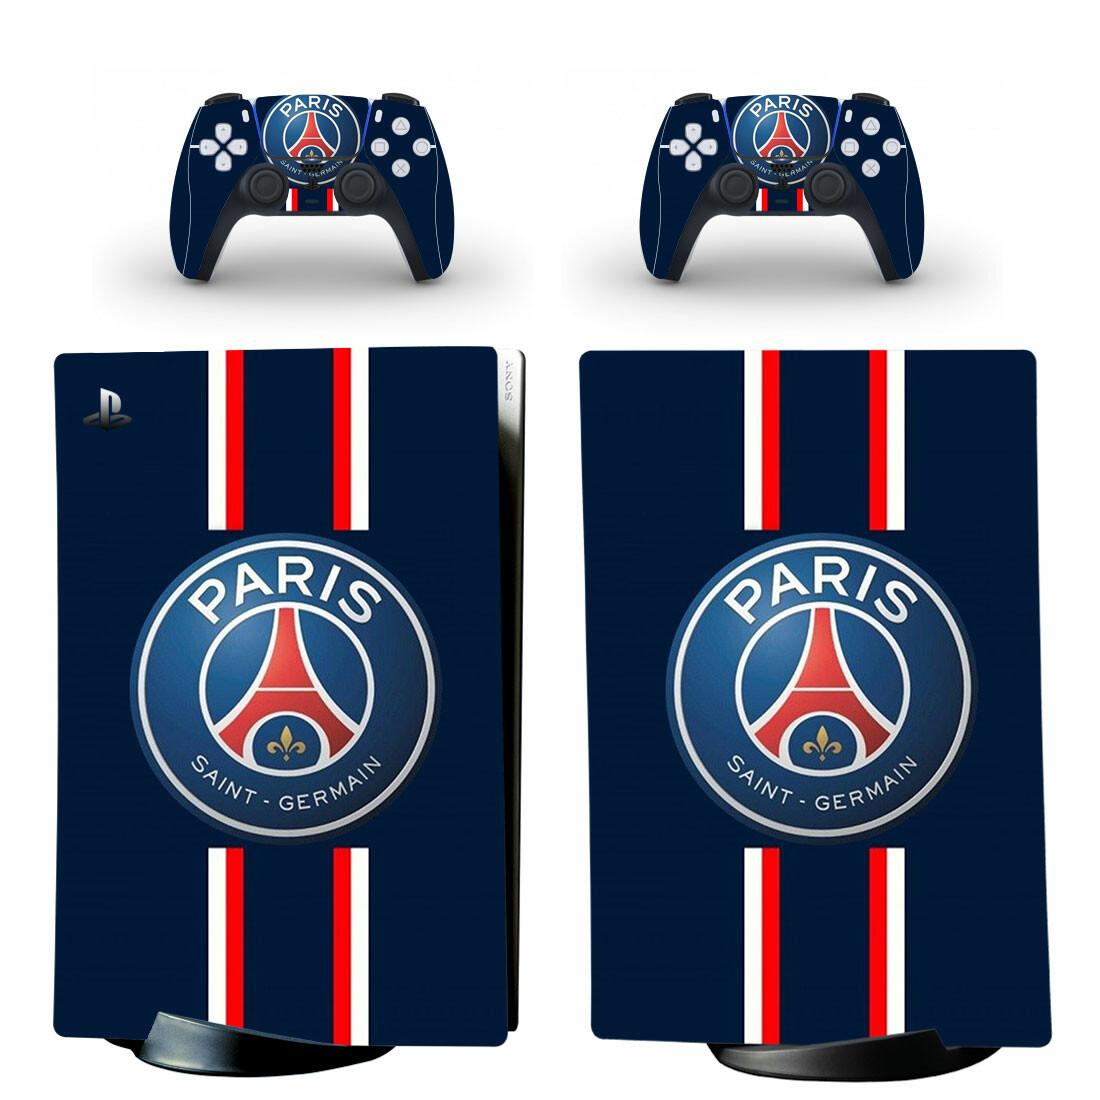 Paris Saint-Germain F.C PS5 Digital Edition Skin Sticker Decal Design 1